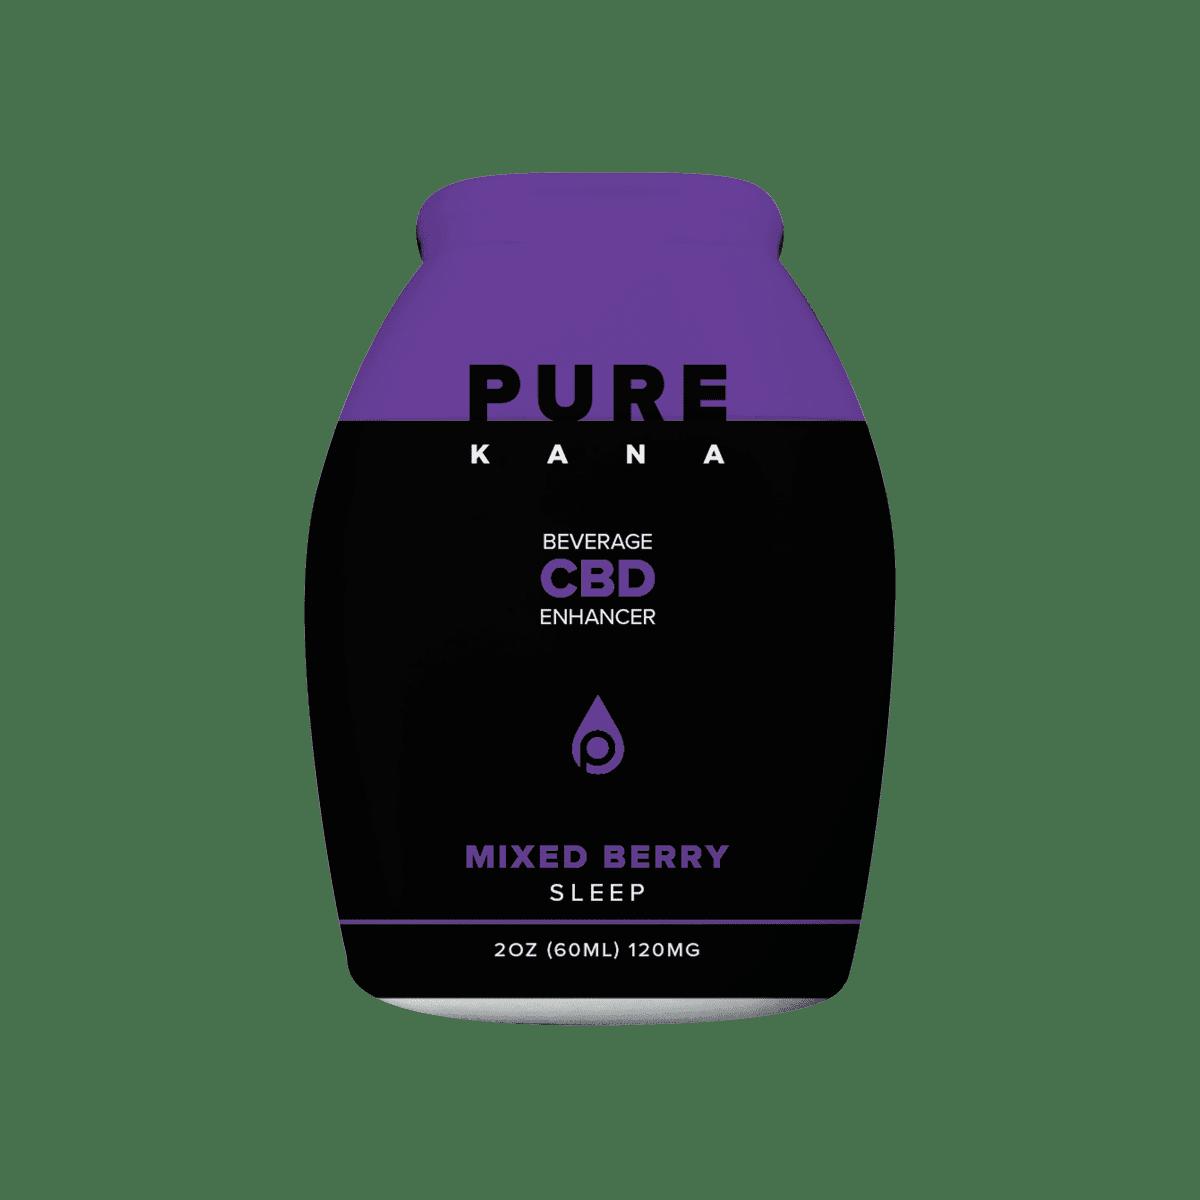 PureKana Mixed Berry for Sleep CBD Beverage Enhancer 2oz (60ml) 120mg CBD | PureKana